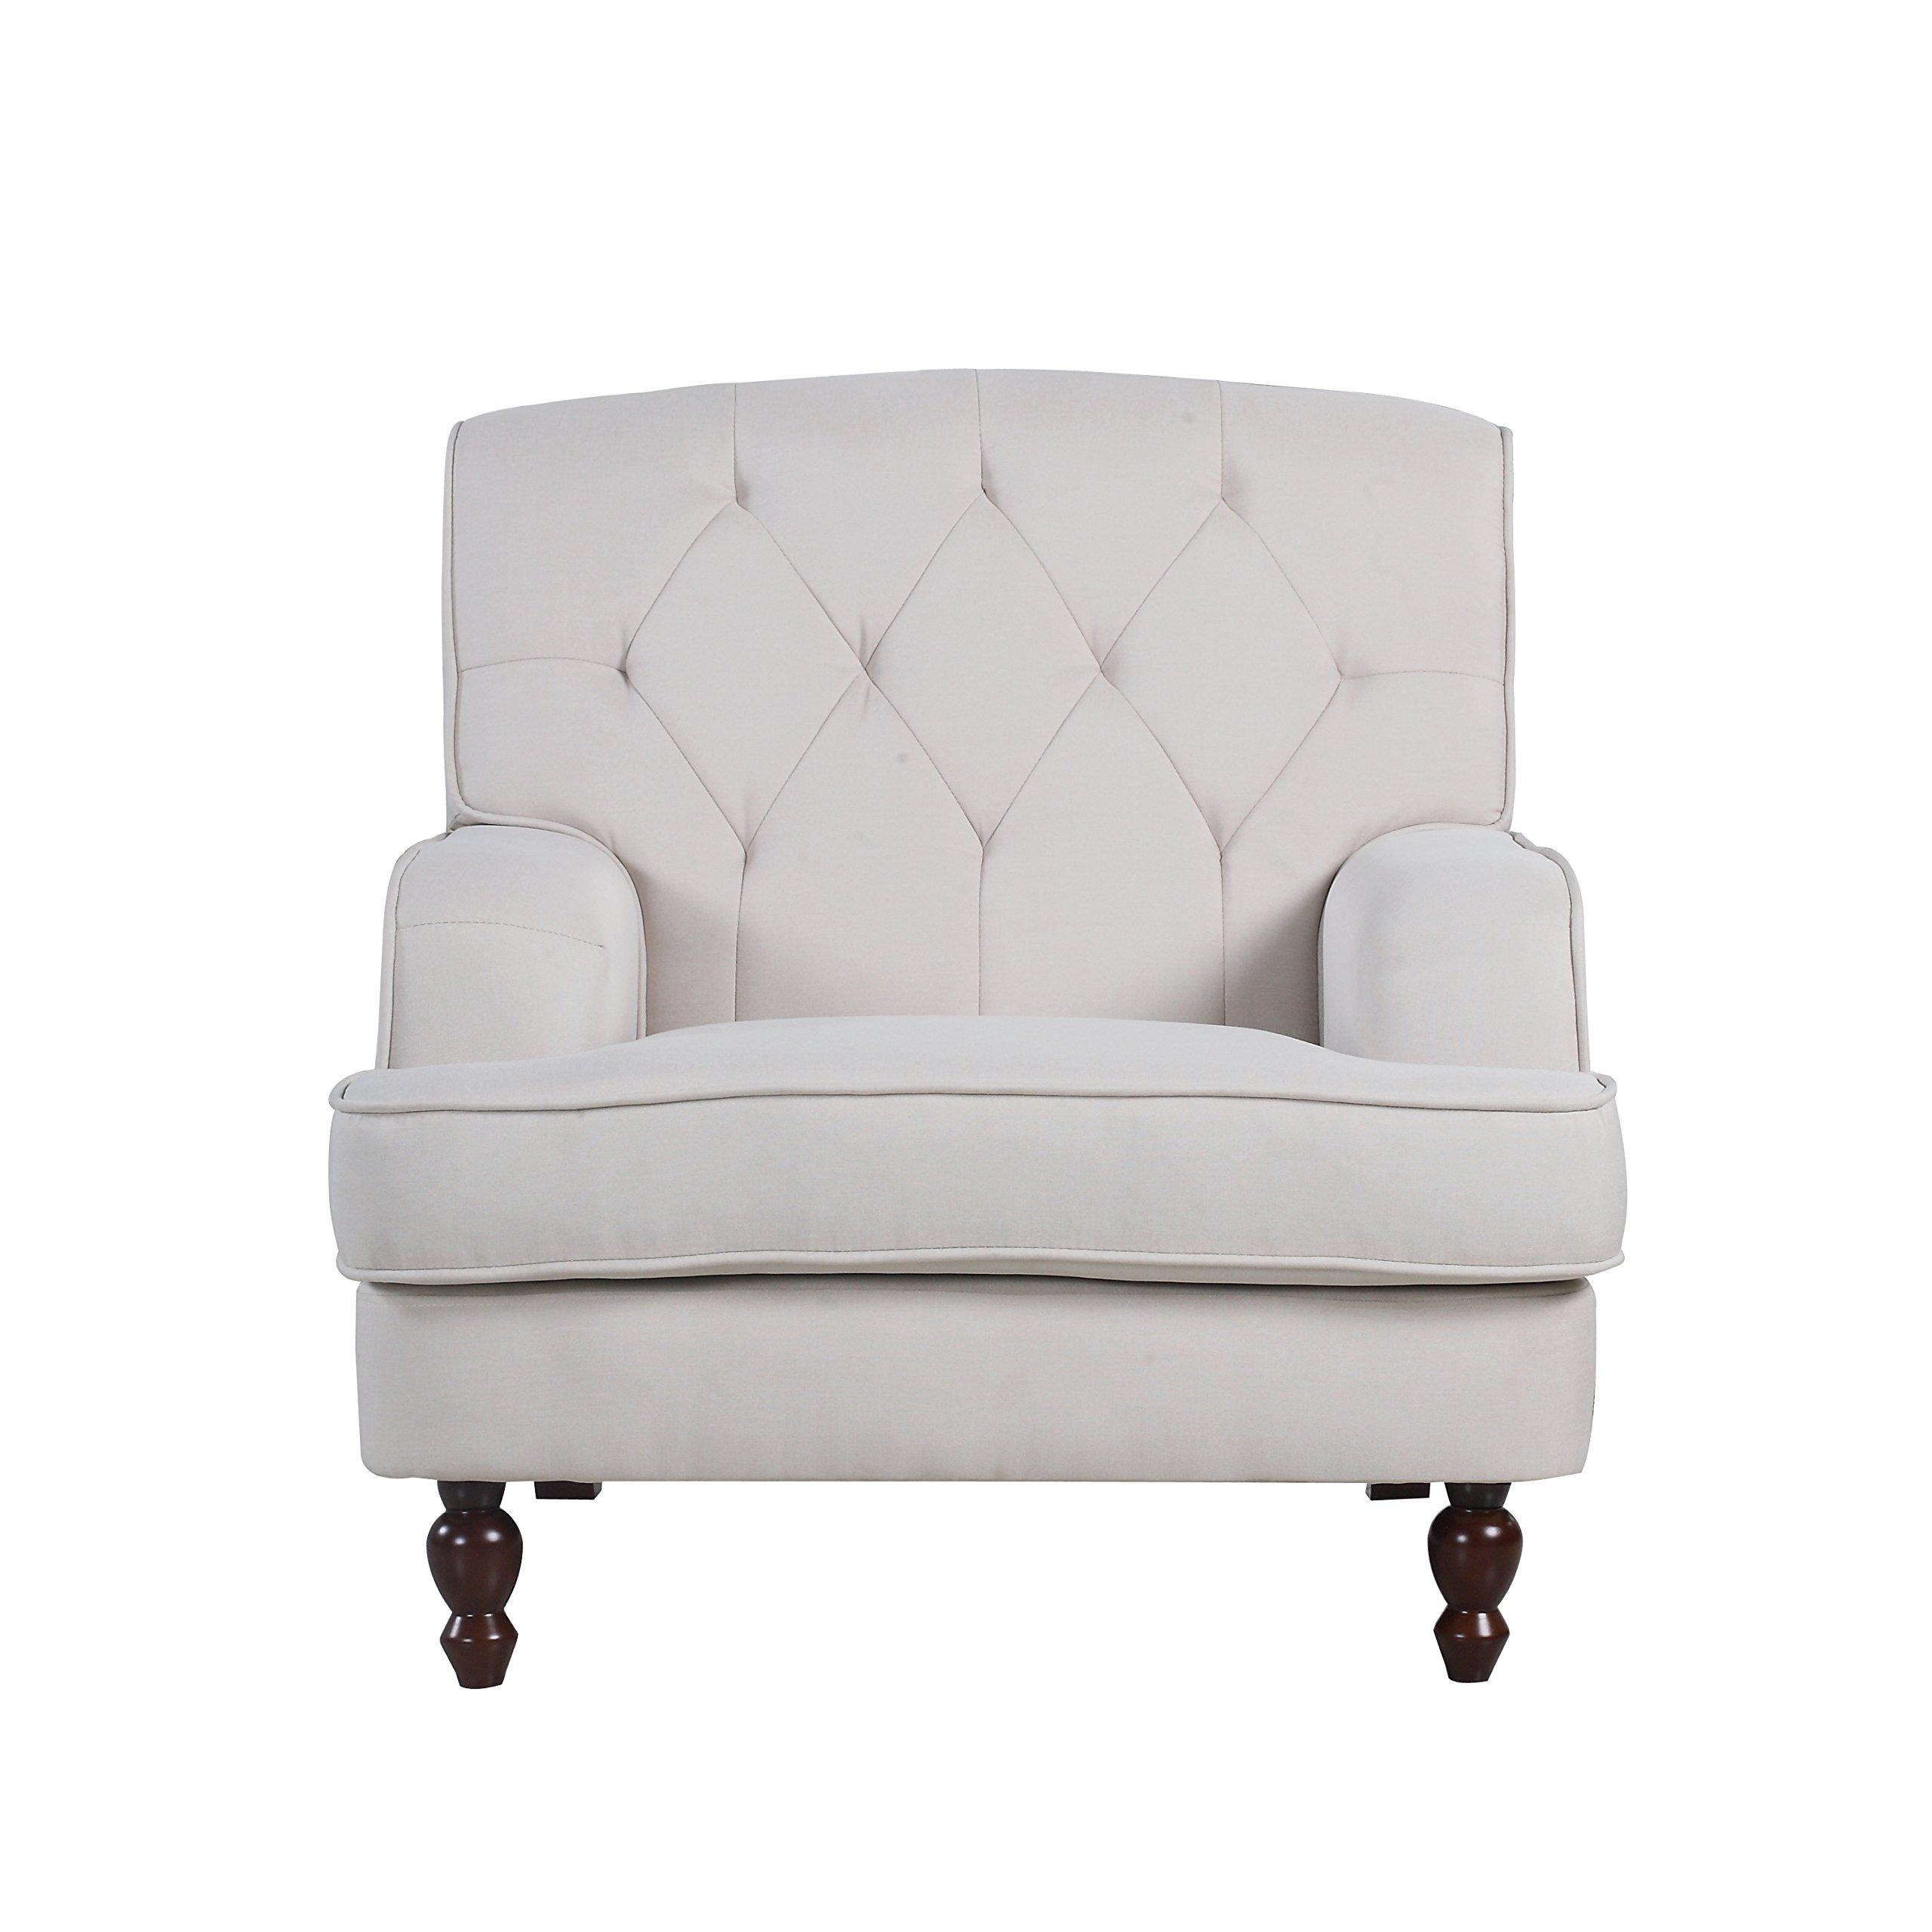 DIVANO ROMA FURNITURE Modern Tufted Fabric Living Room Armchair (Beige) by DIVANO ROMA FURNITURE